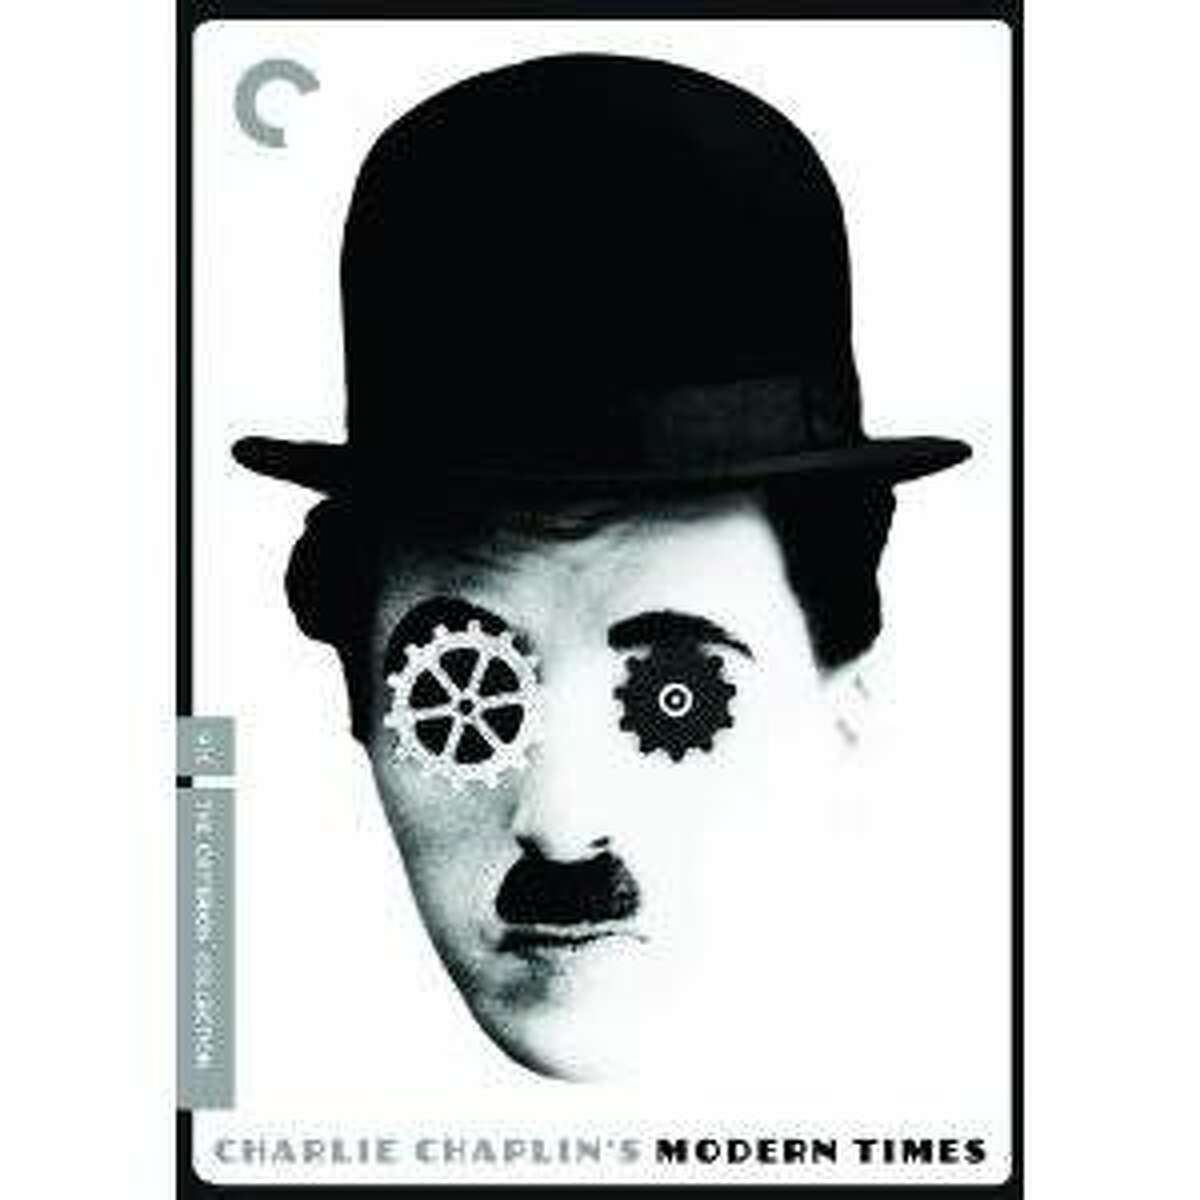 dvd cover MODERN TIMES